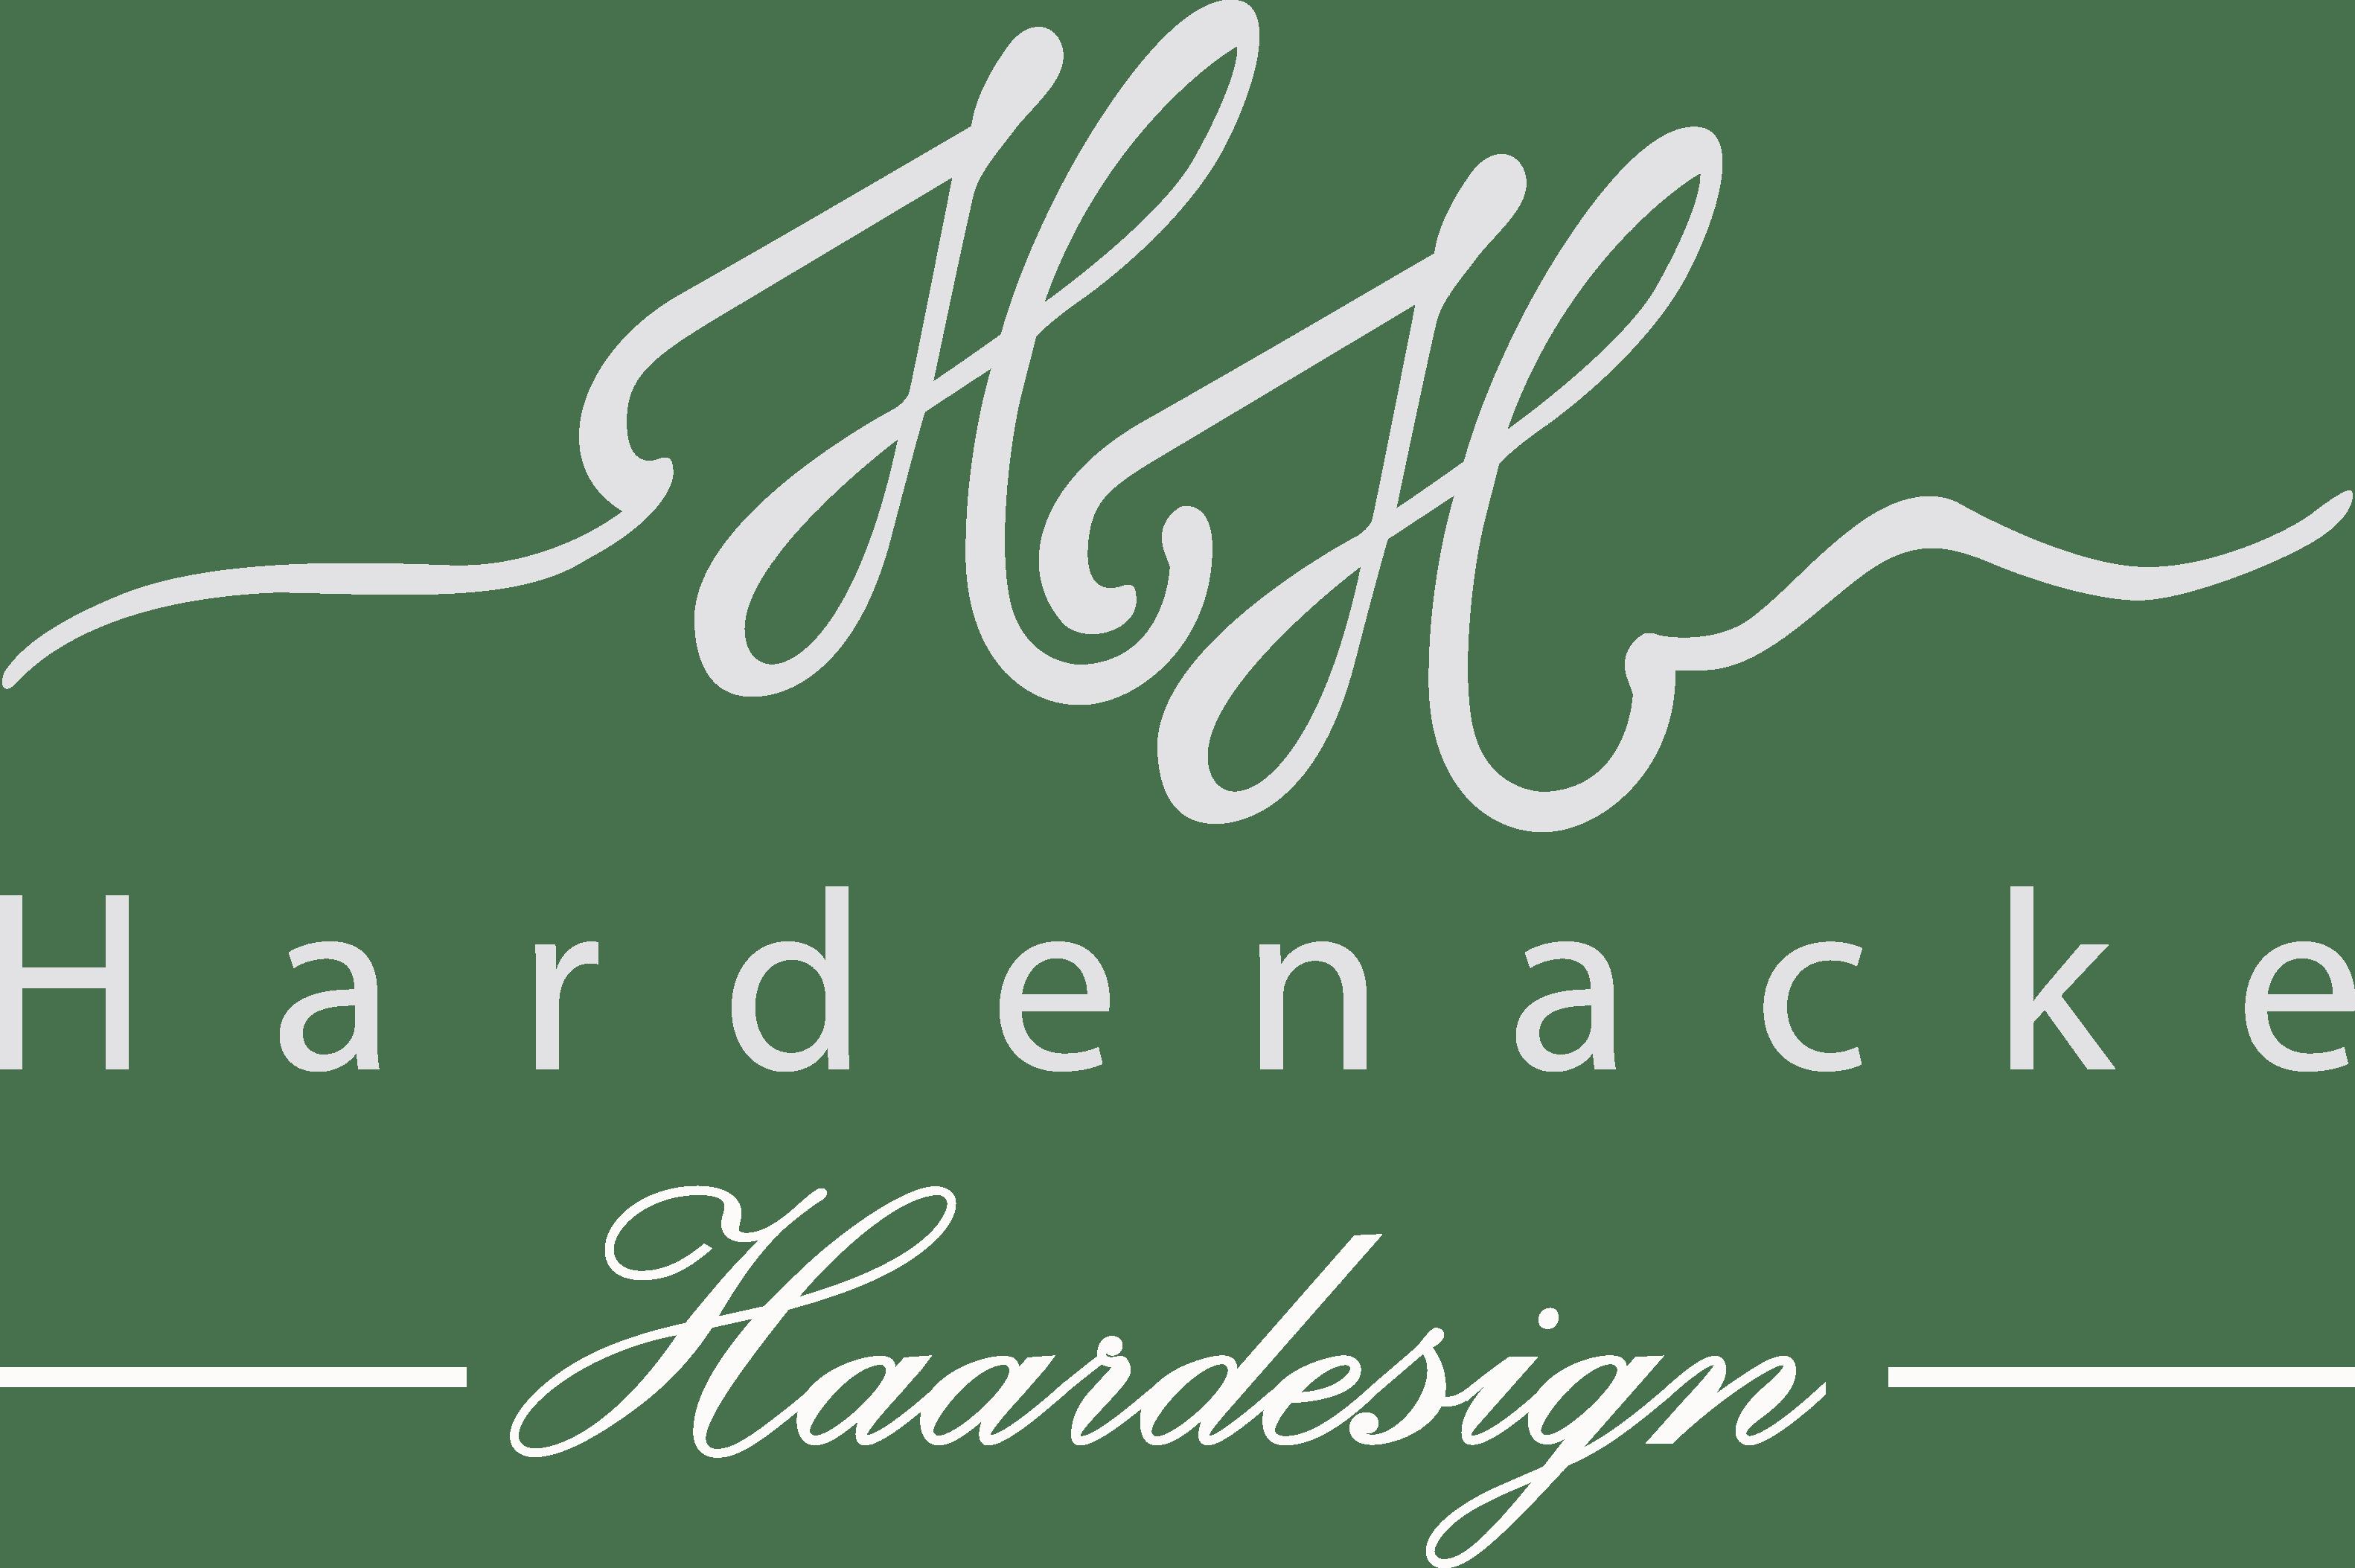 Jens Hardenacke